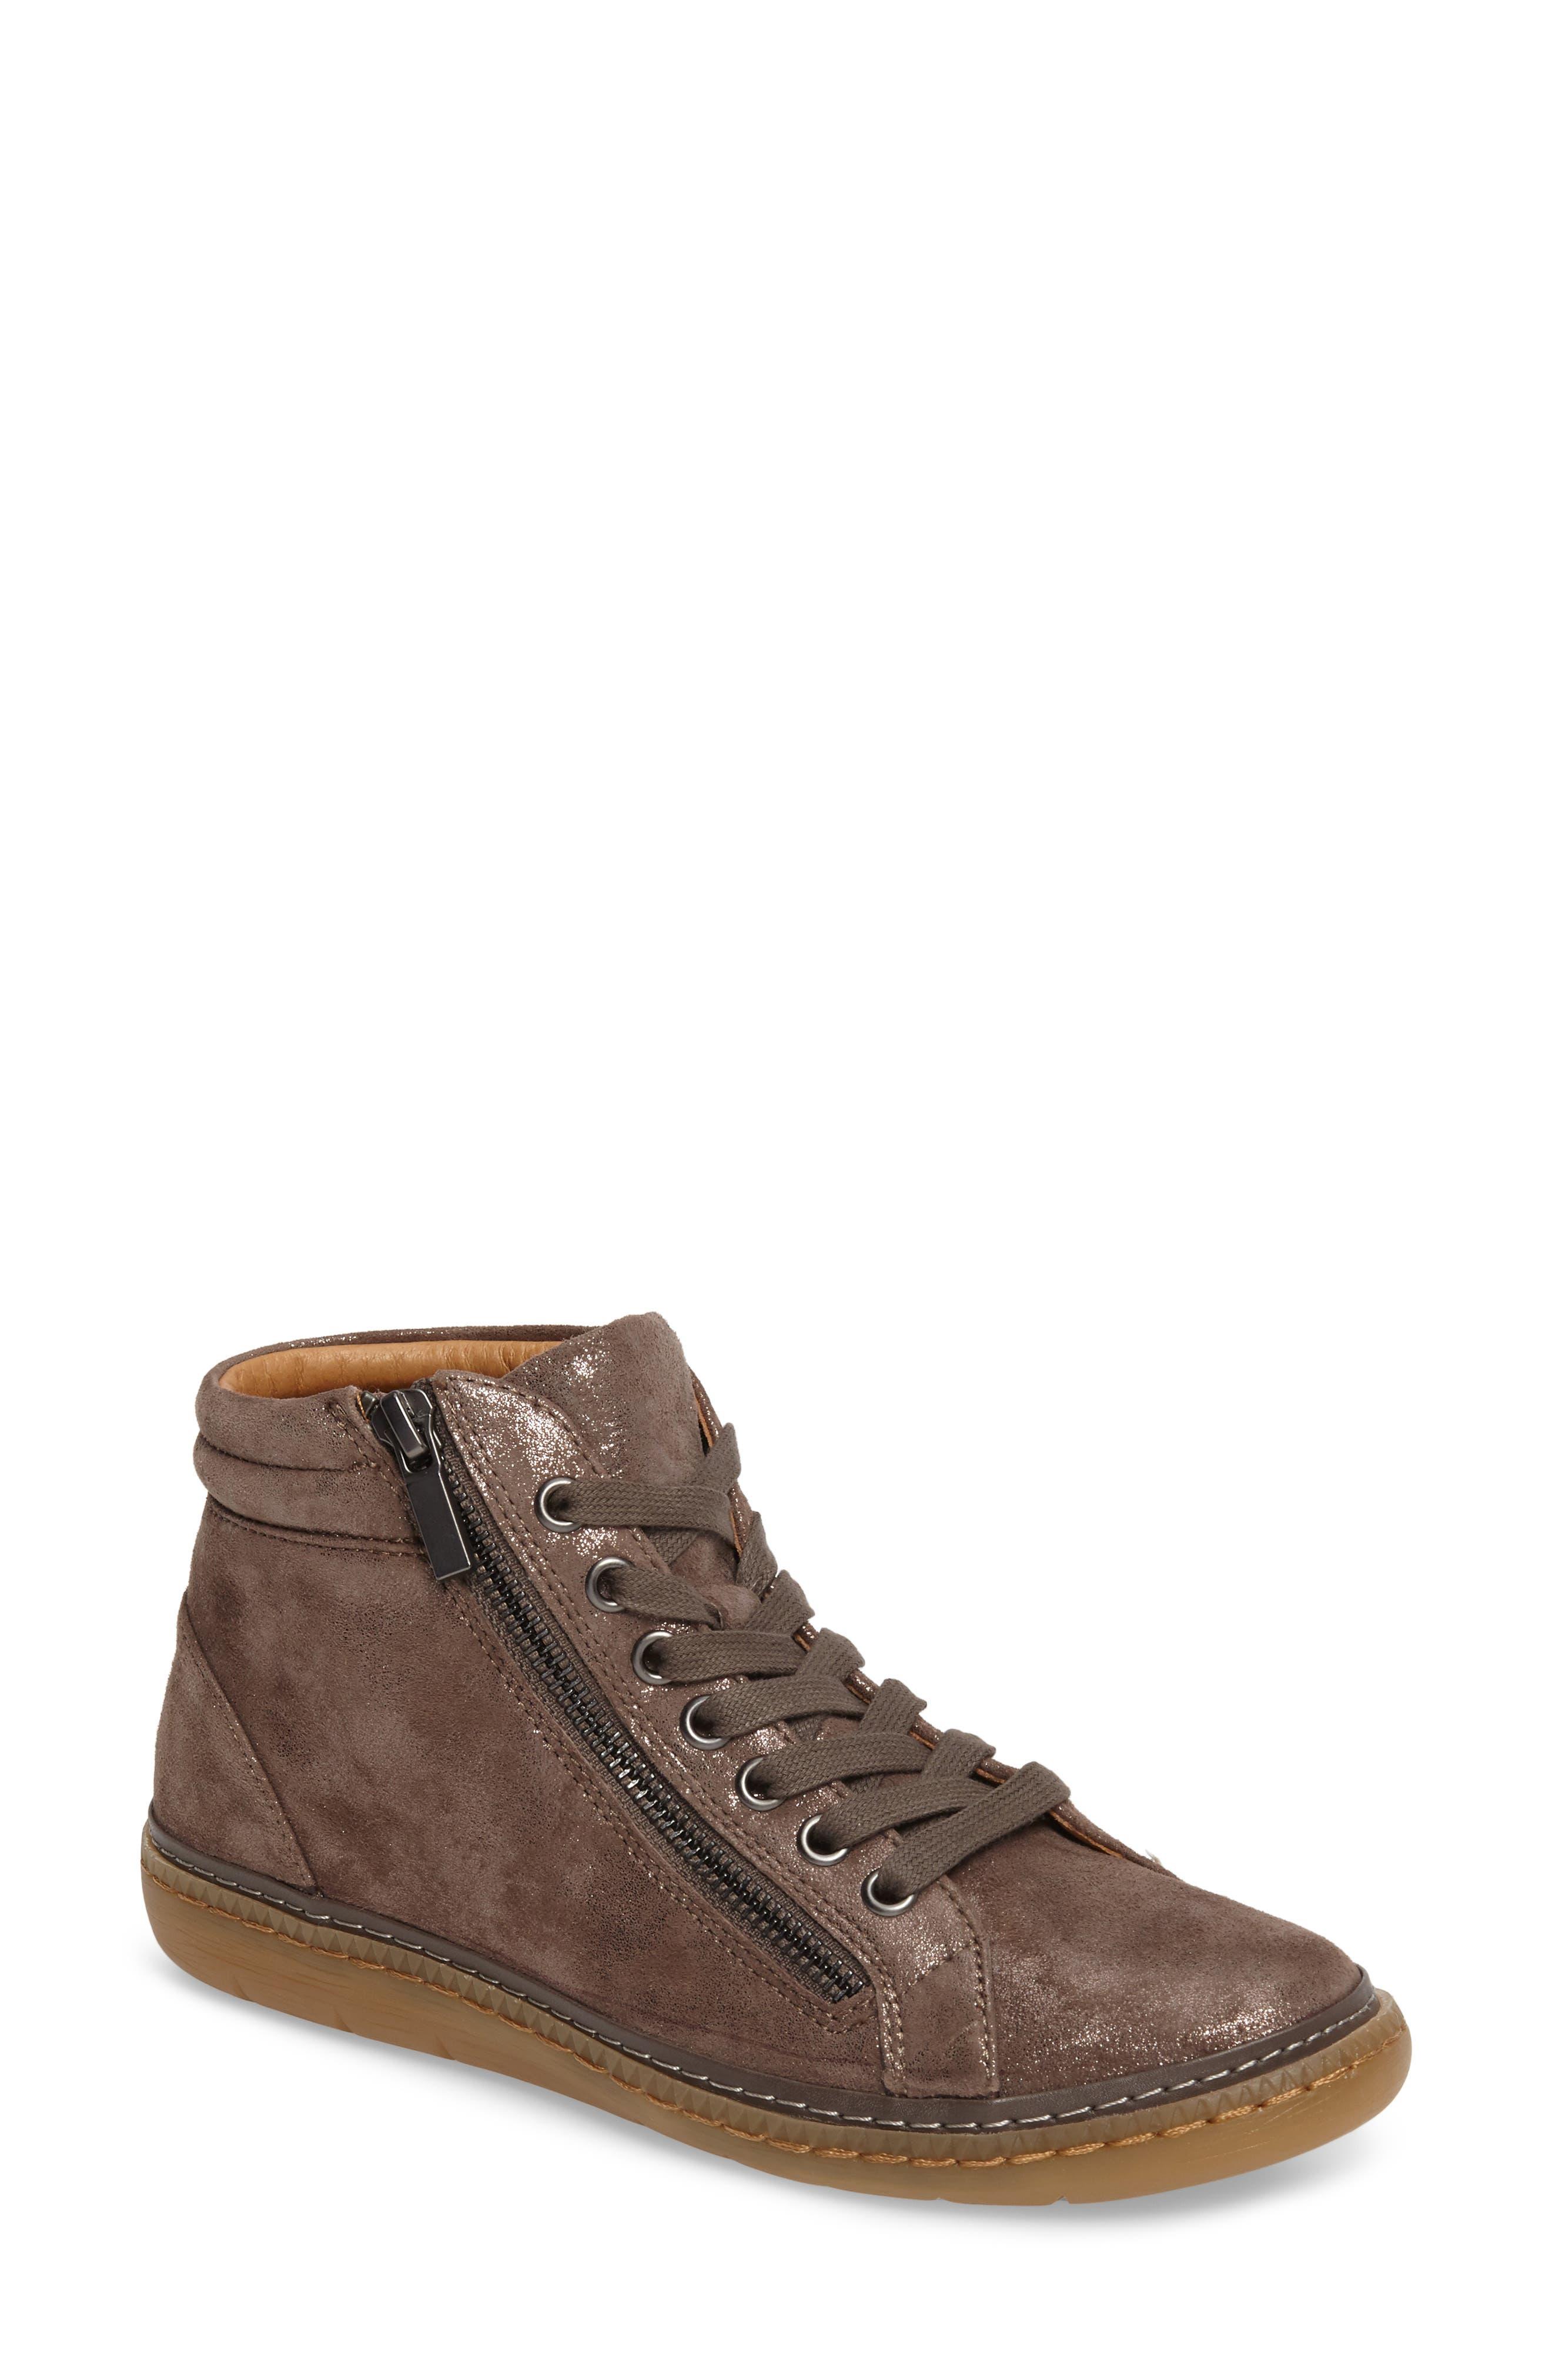 SÖFFT, Annaleigh High Top Sneaker, Main thumbnail 1, color, SMOKE FOIL SUEDE